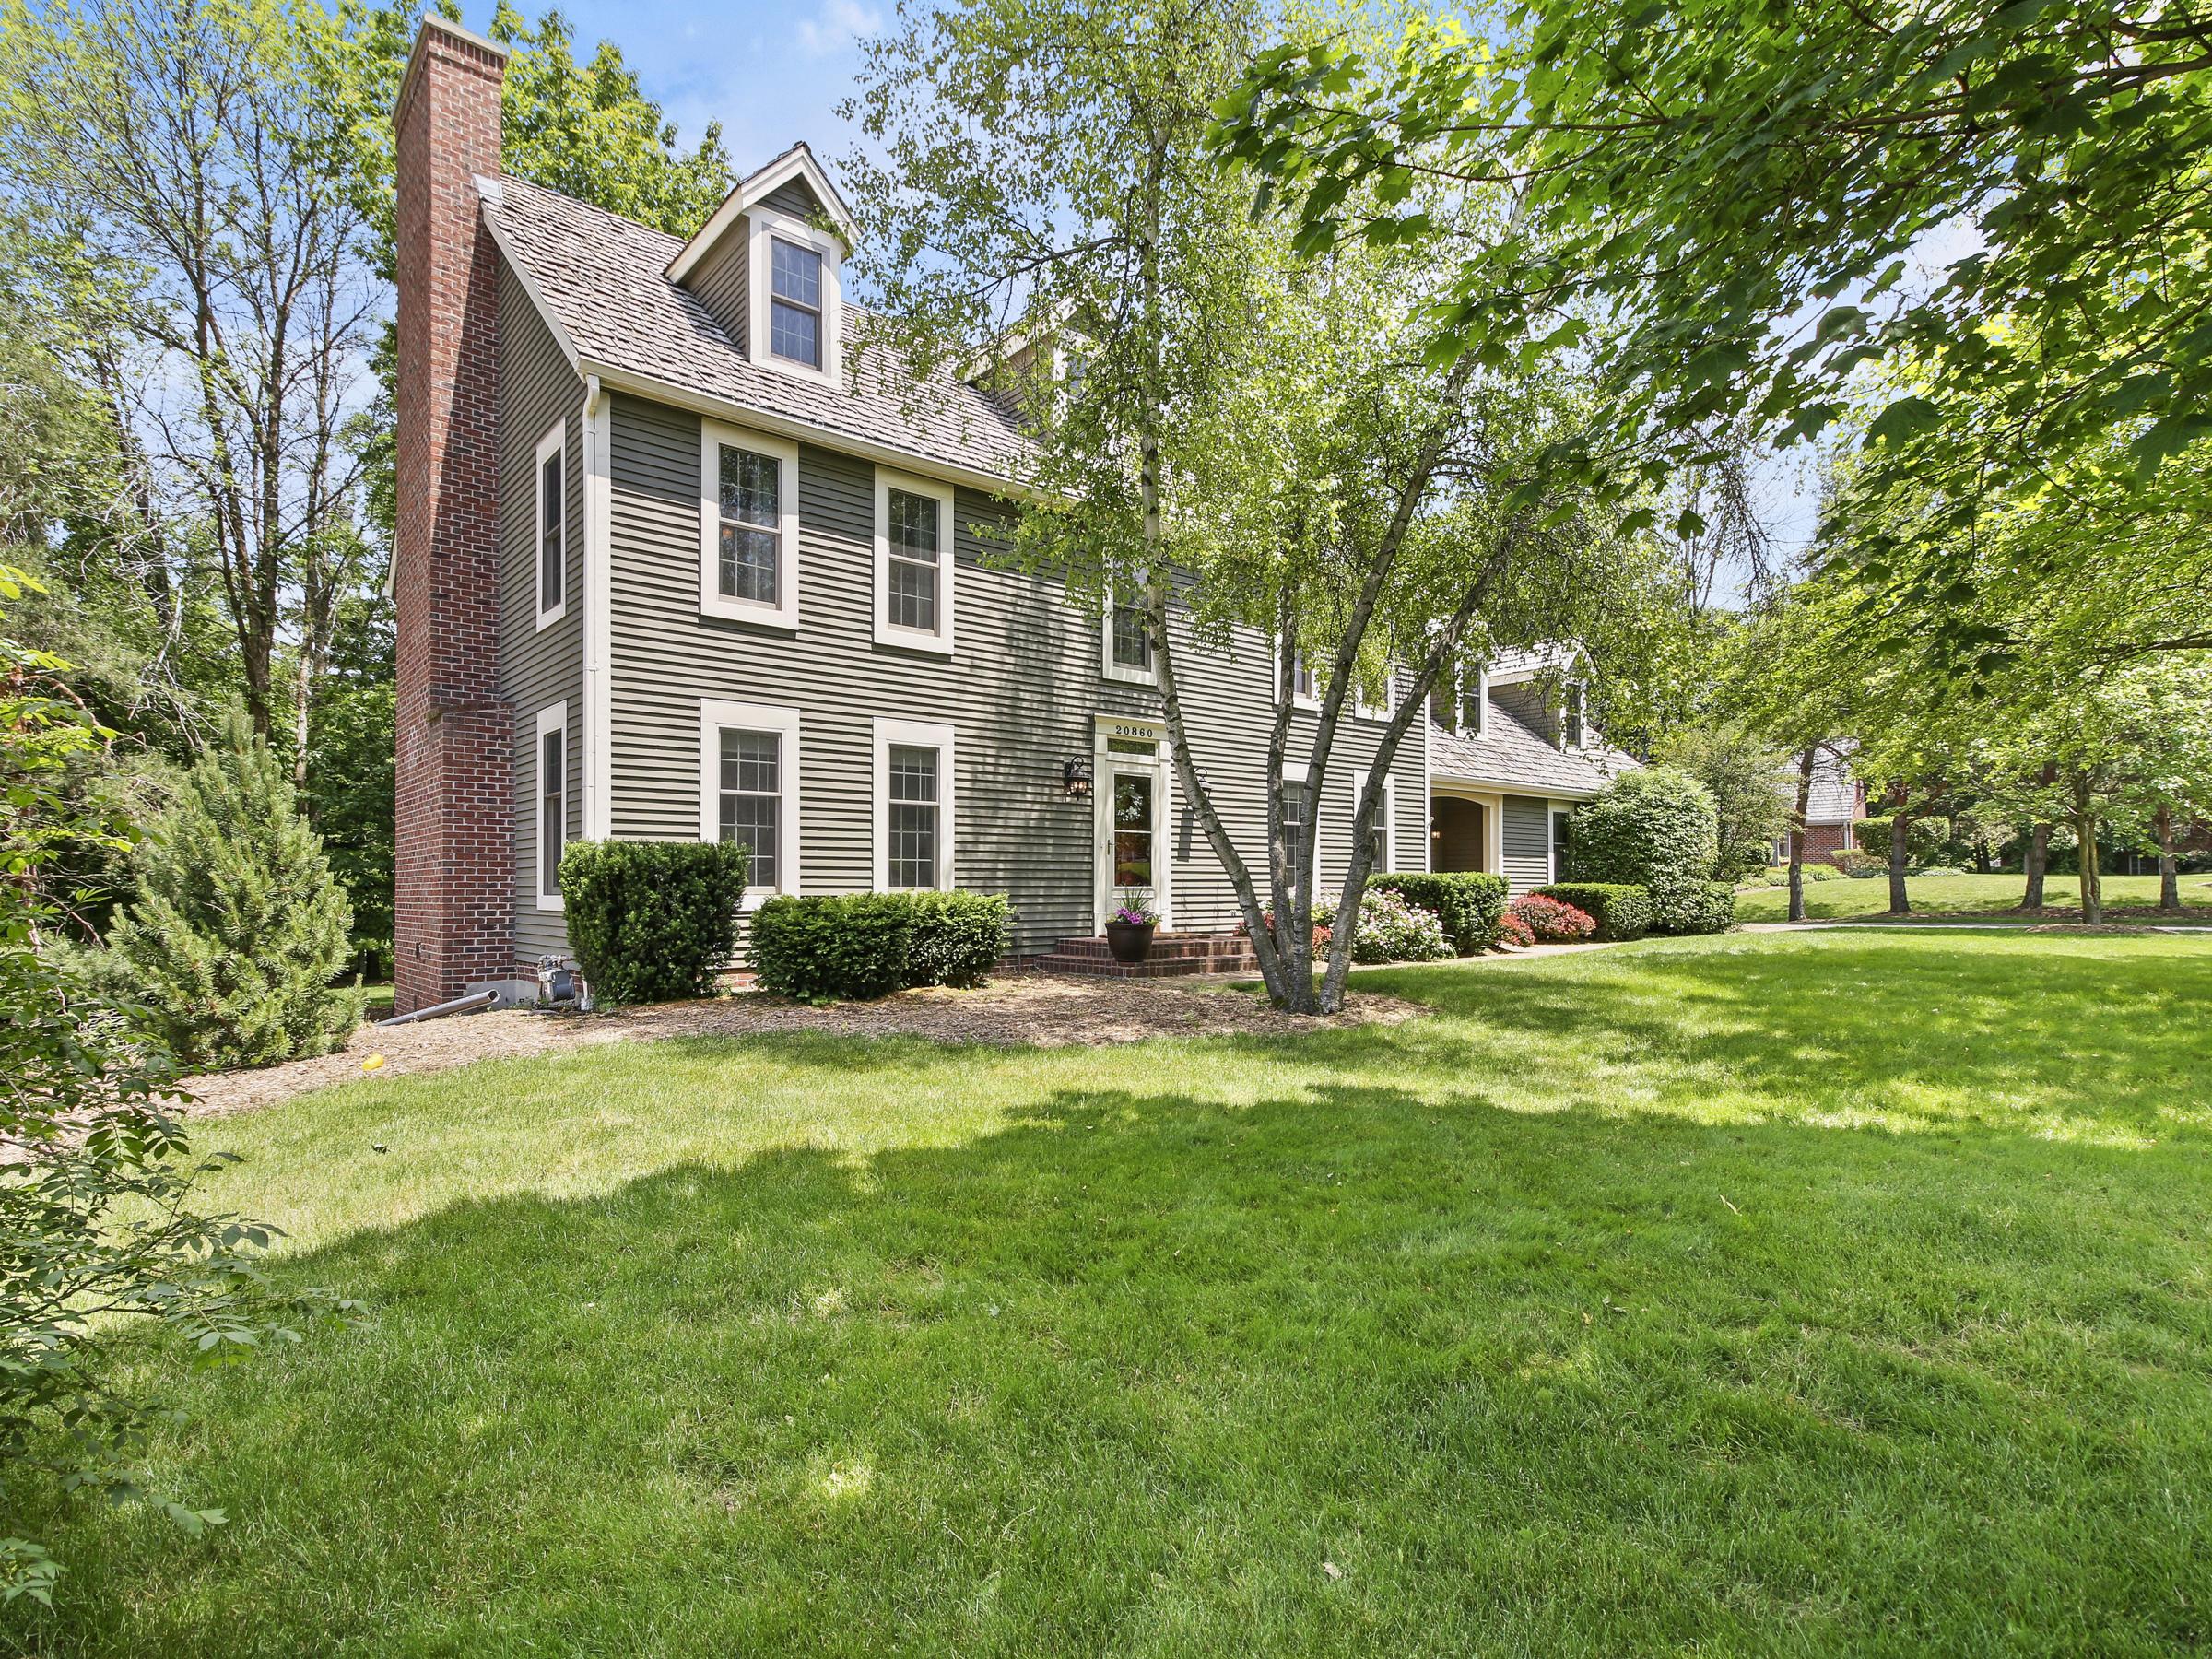 20860 Saxon Ct, Brookfield, Wisconsin 53045, 4 Bedrooms Bedrooms, 8 Rooms Rooms,3 BathroomsBathrooms,Single-Family,For Sale,Saxon Ct,1694463